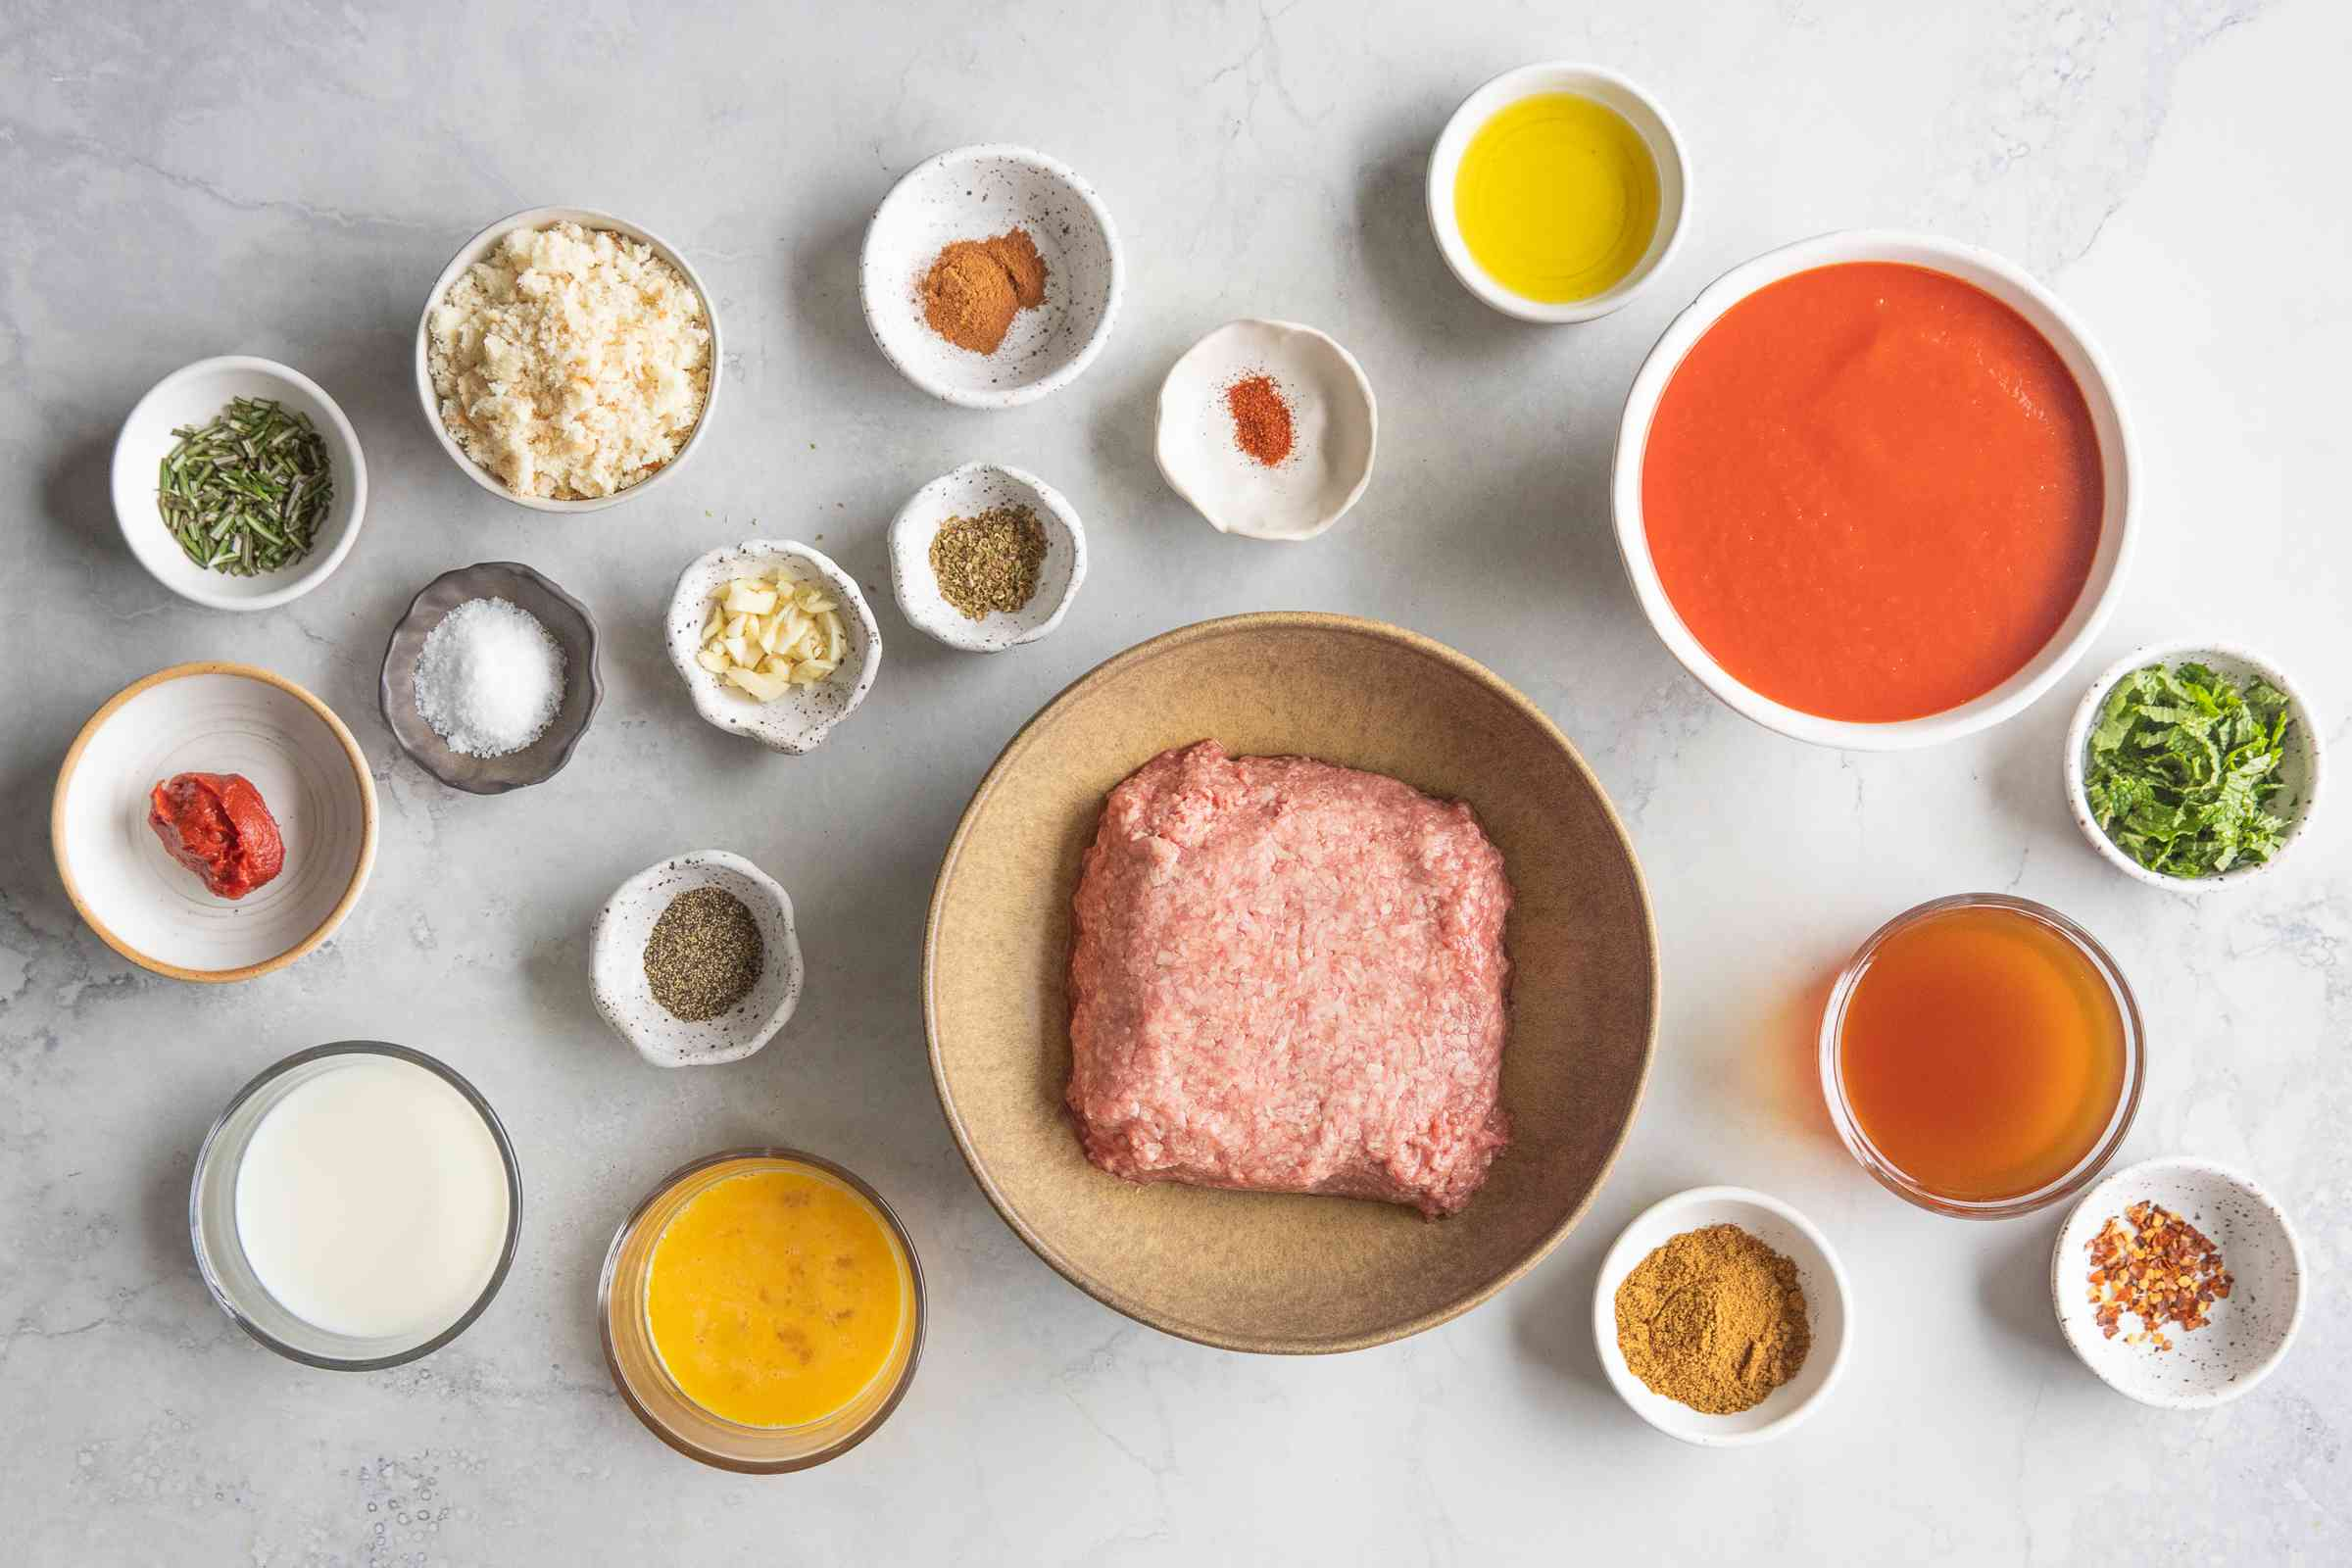 Easy Lamb Meatballs ingredients